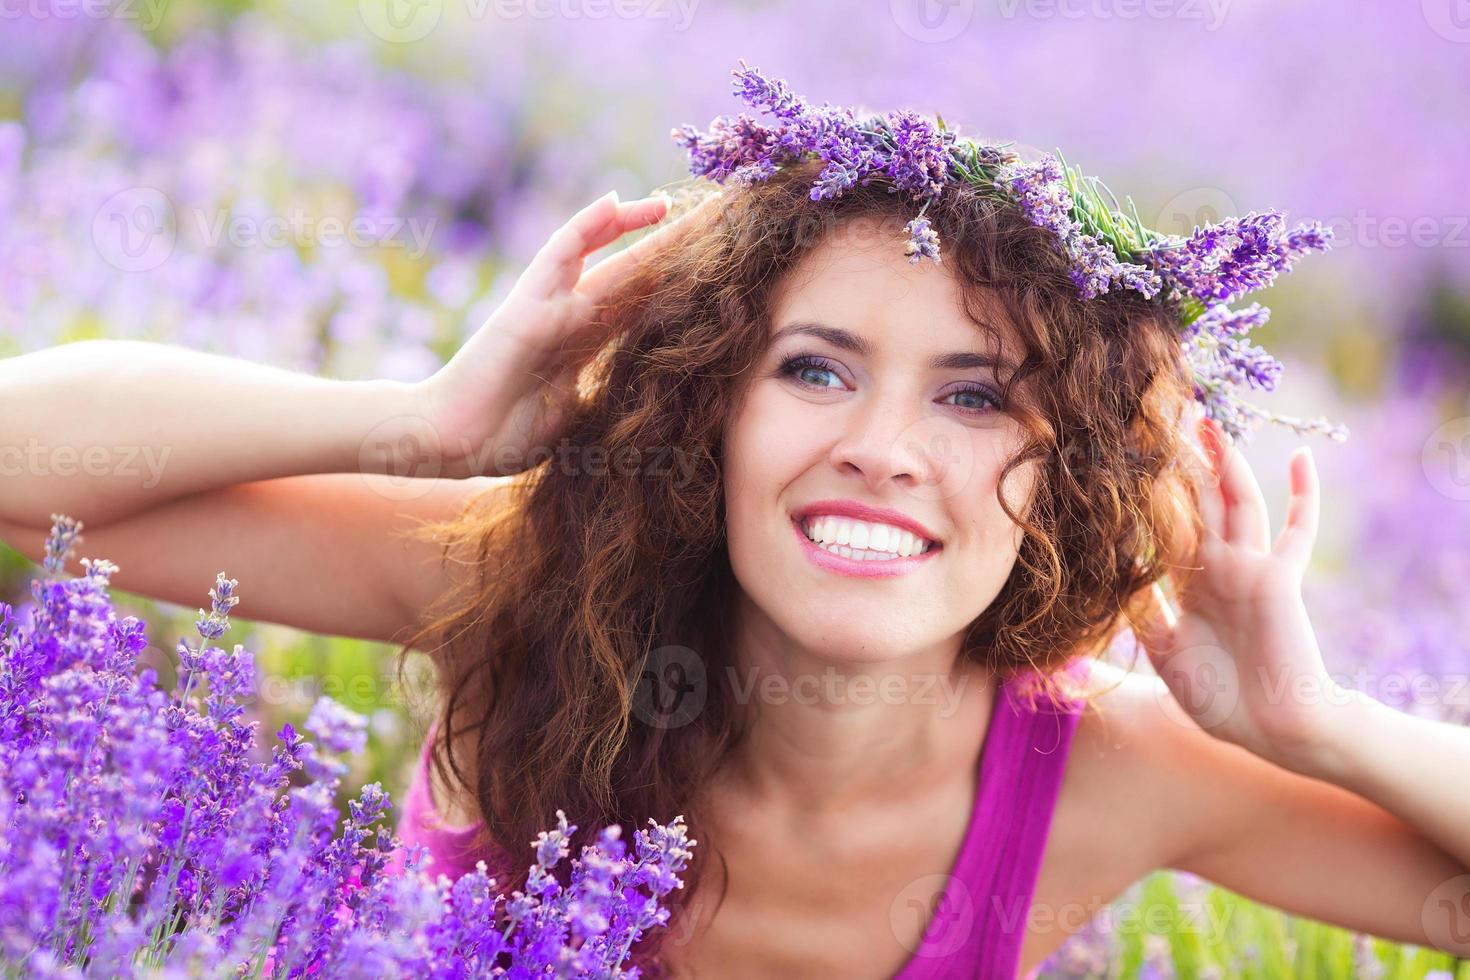 Girl on lavender field photo